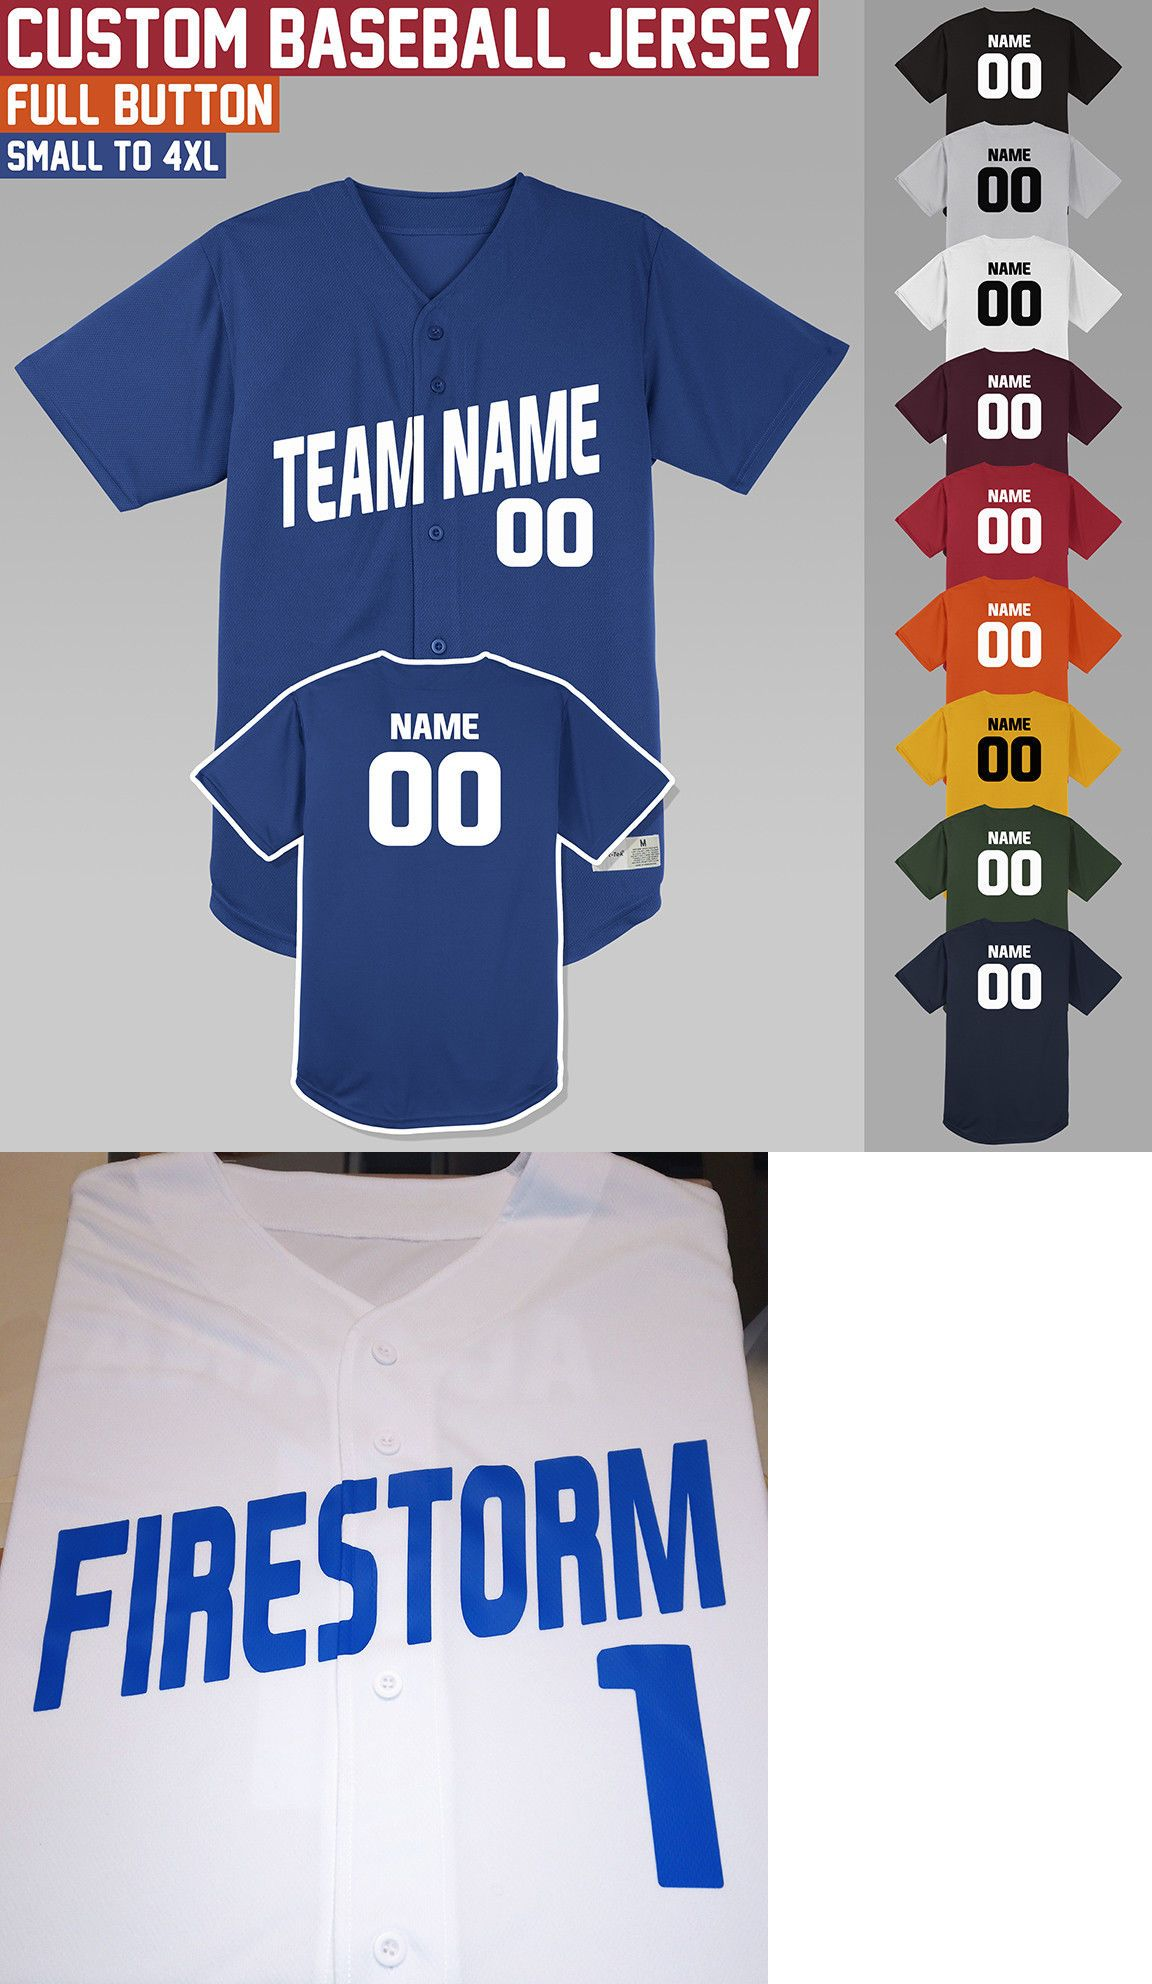 Baseball Shirts And Jerseys 181336 Custom Baseball Jersey Full